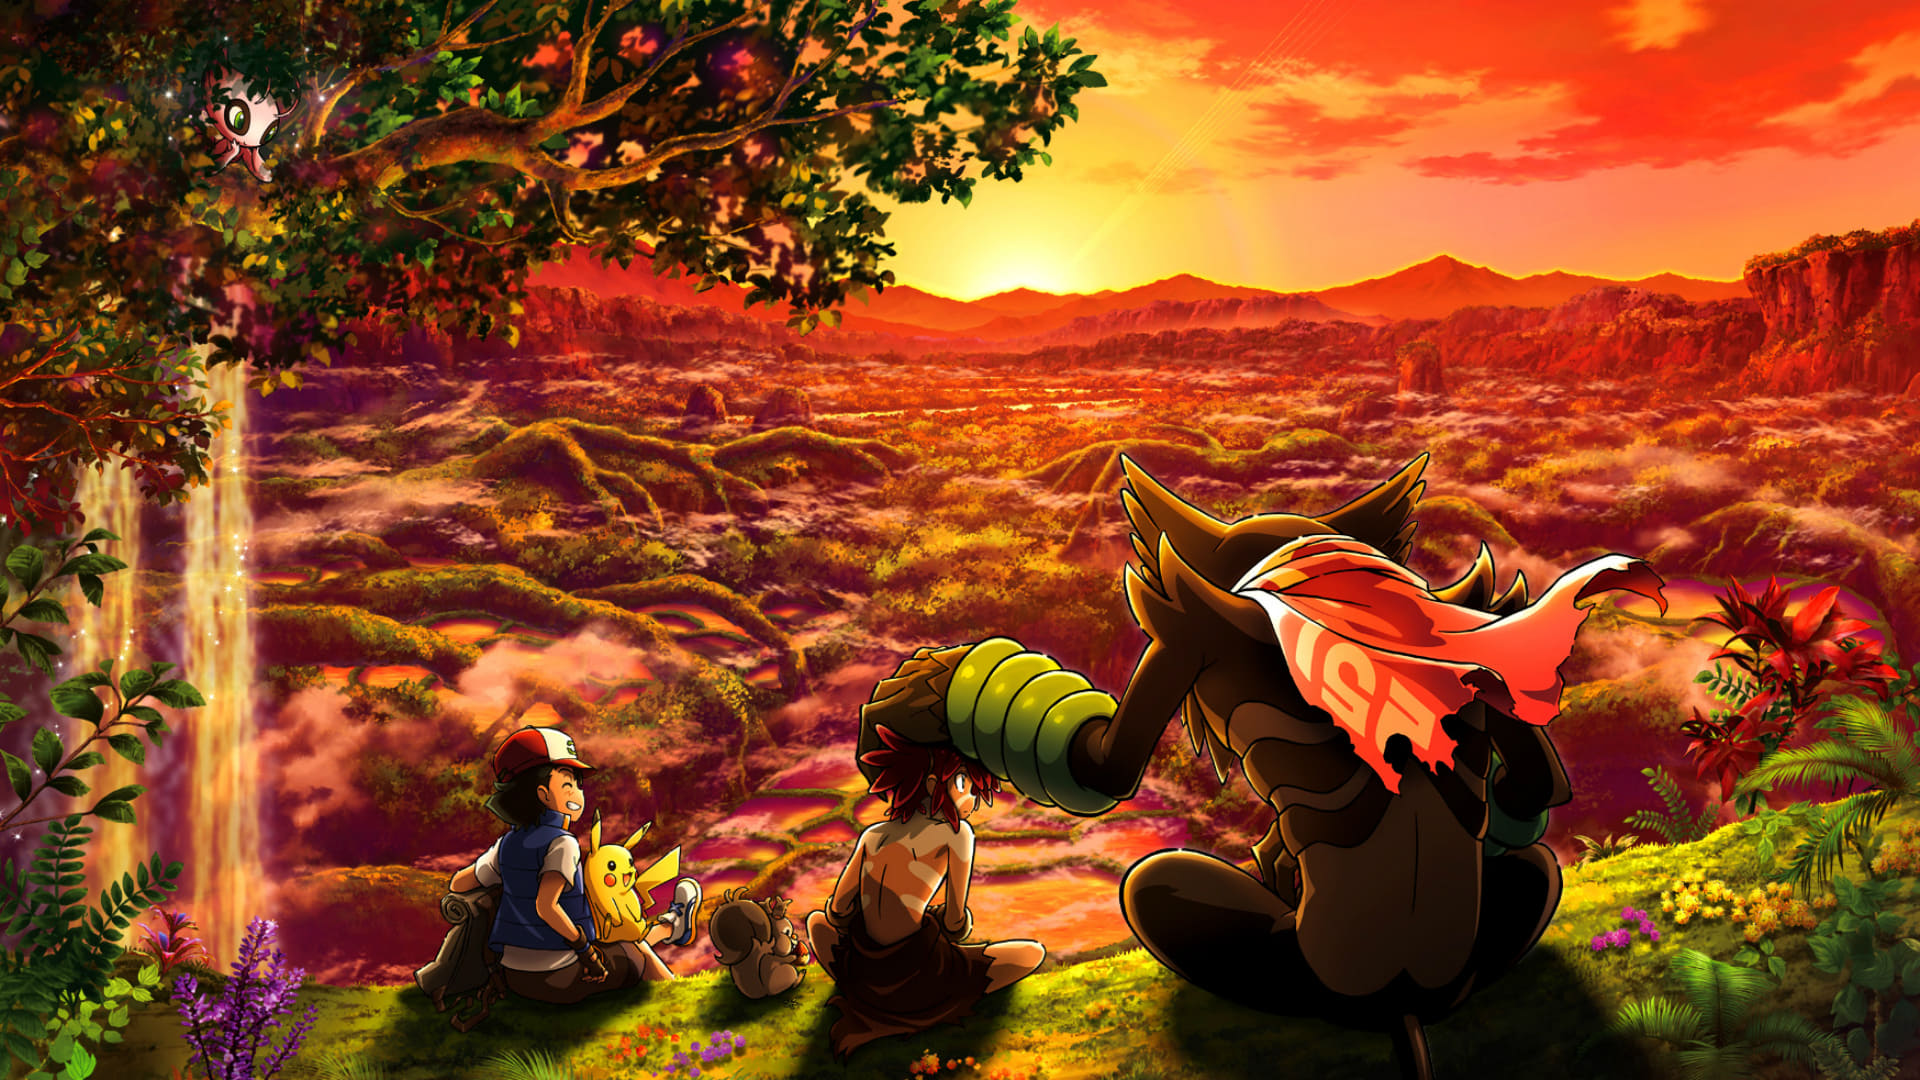 Pokémon The Movie: Secrets of the Jungle Promo Art